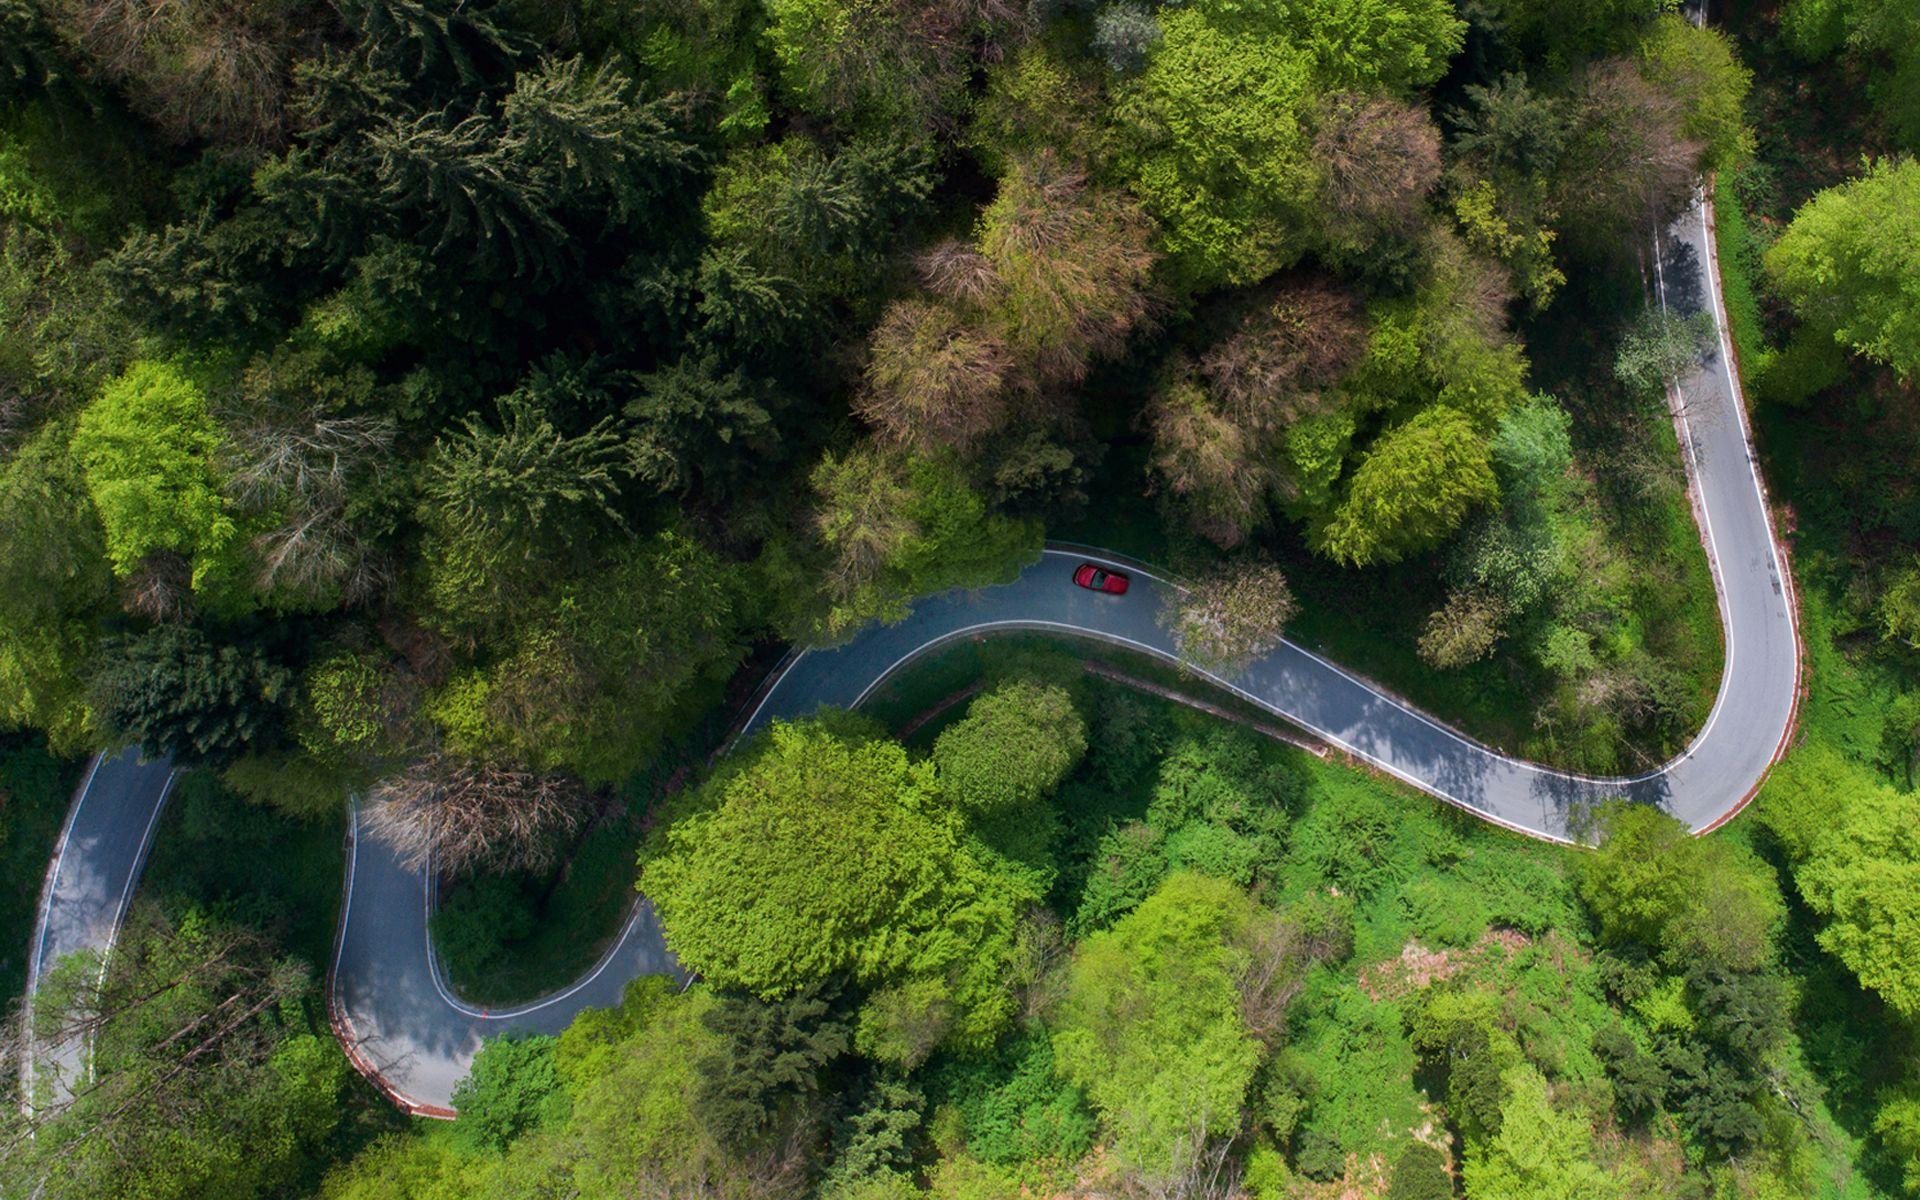 World's Best Drives: Cruising Through The Italian Countryside In A Ferrari 275